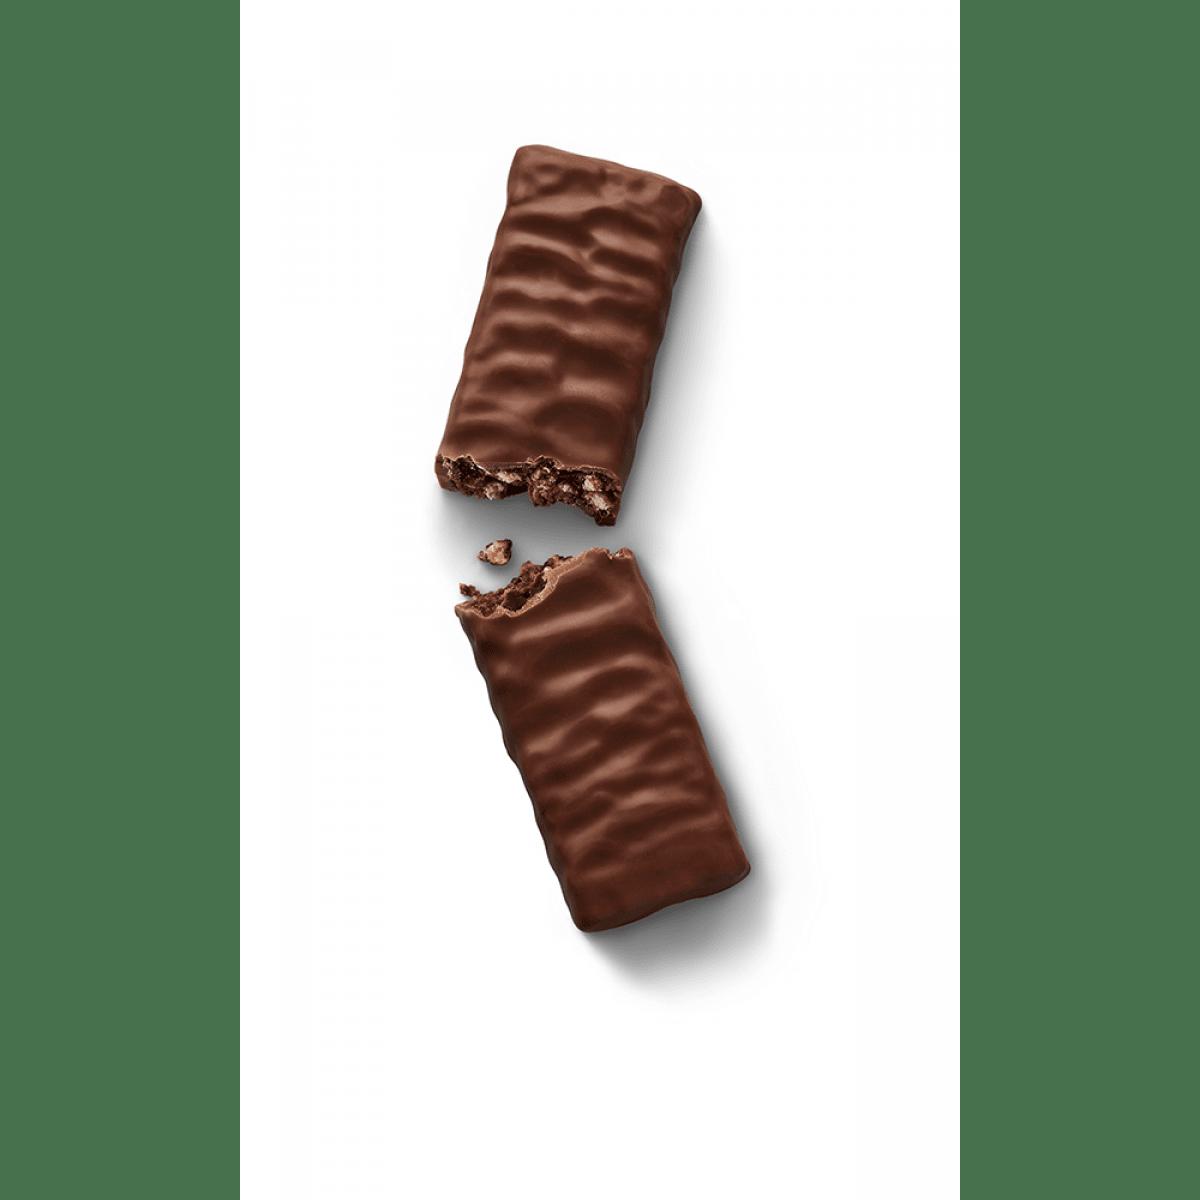 WW Proteinriegel Kokos 5er Pack 1